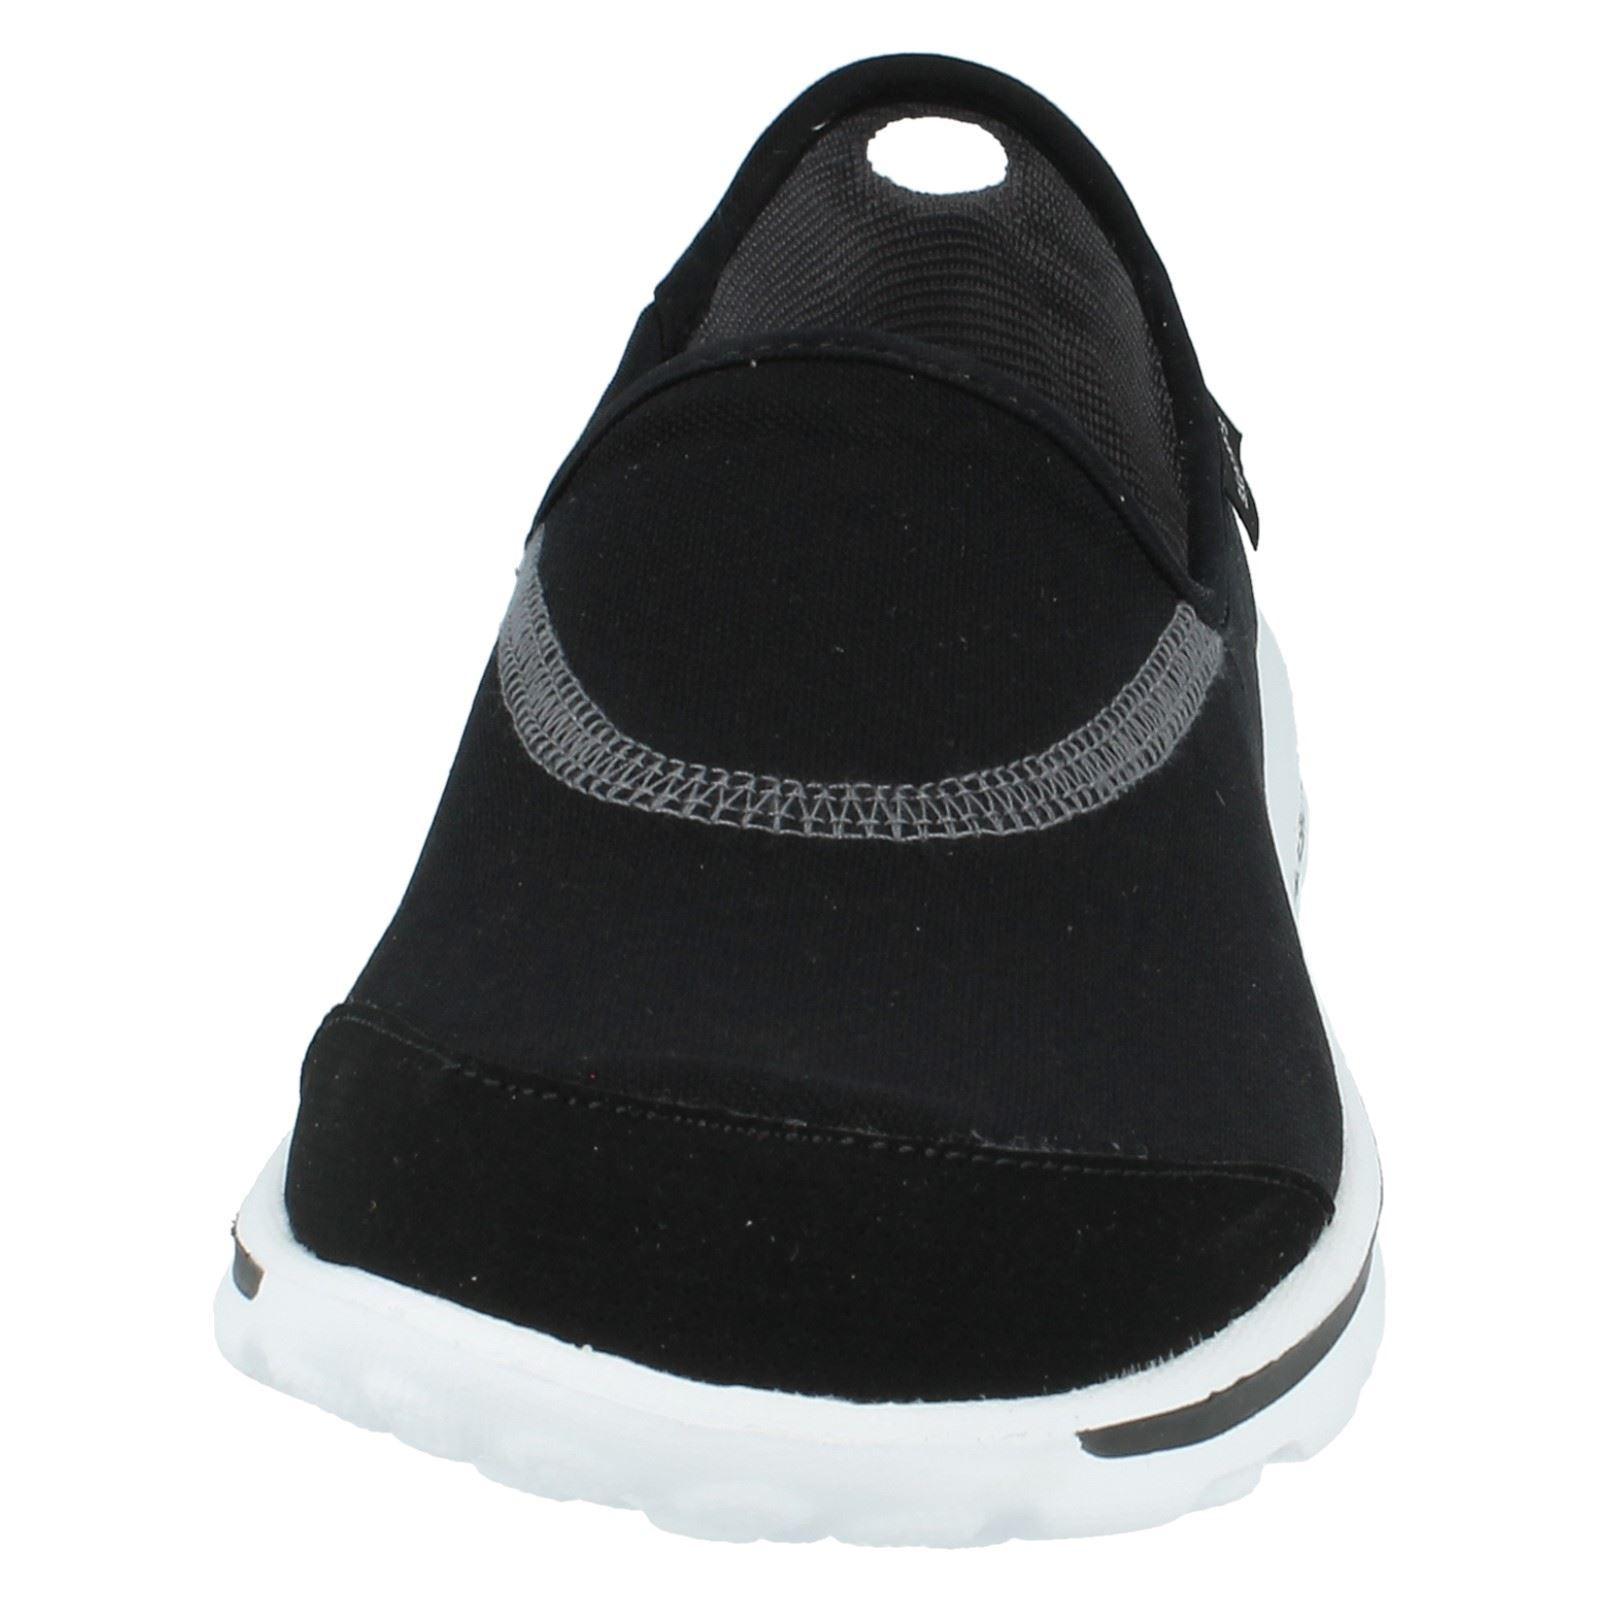 Damas Skechers WalkW Entrenadores EtiquetaGo WalkW Skechers 09252e